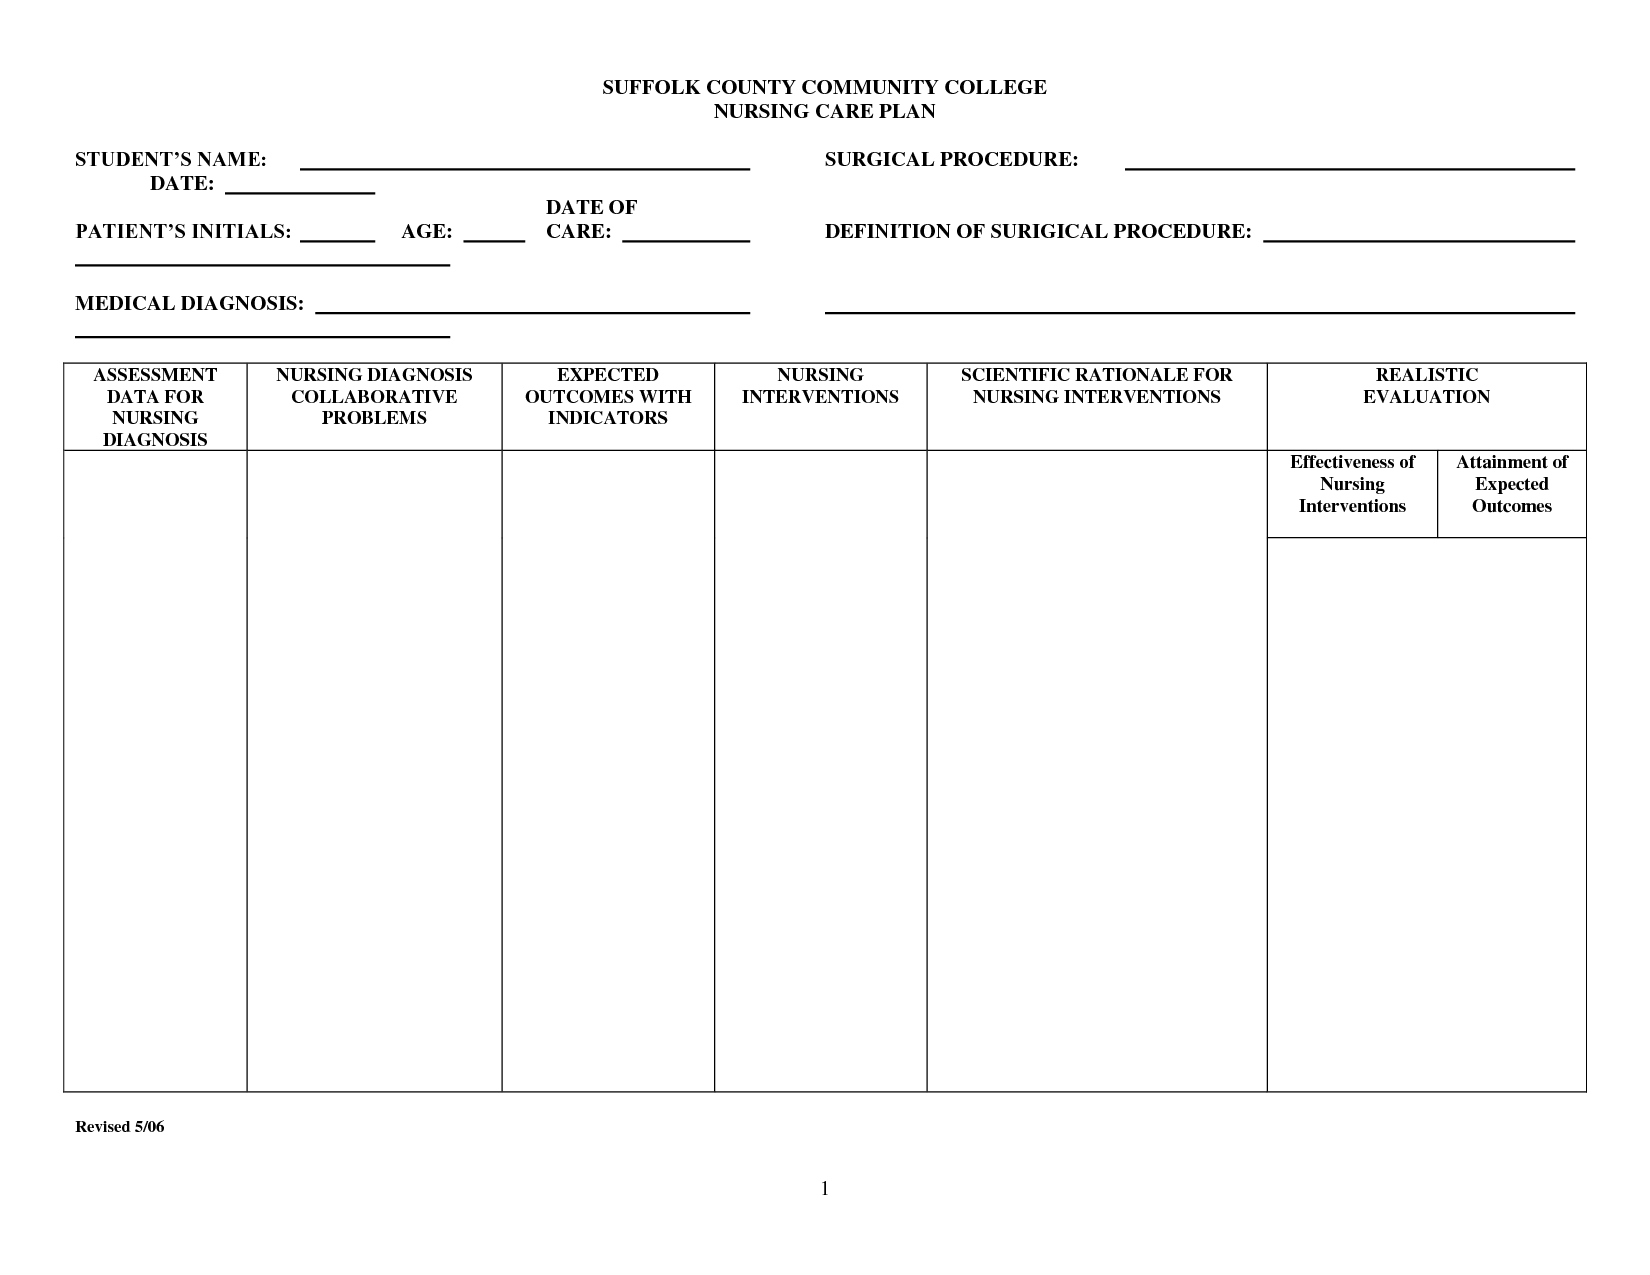 Nursing Care Plan Templates Blank - Atlantaauctionco Regarding Nursing Care Plan Templates Blank